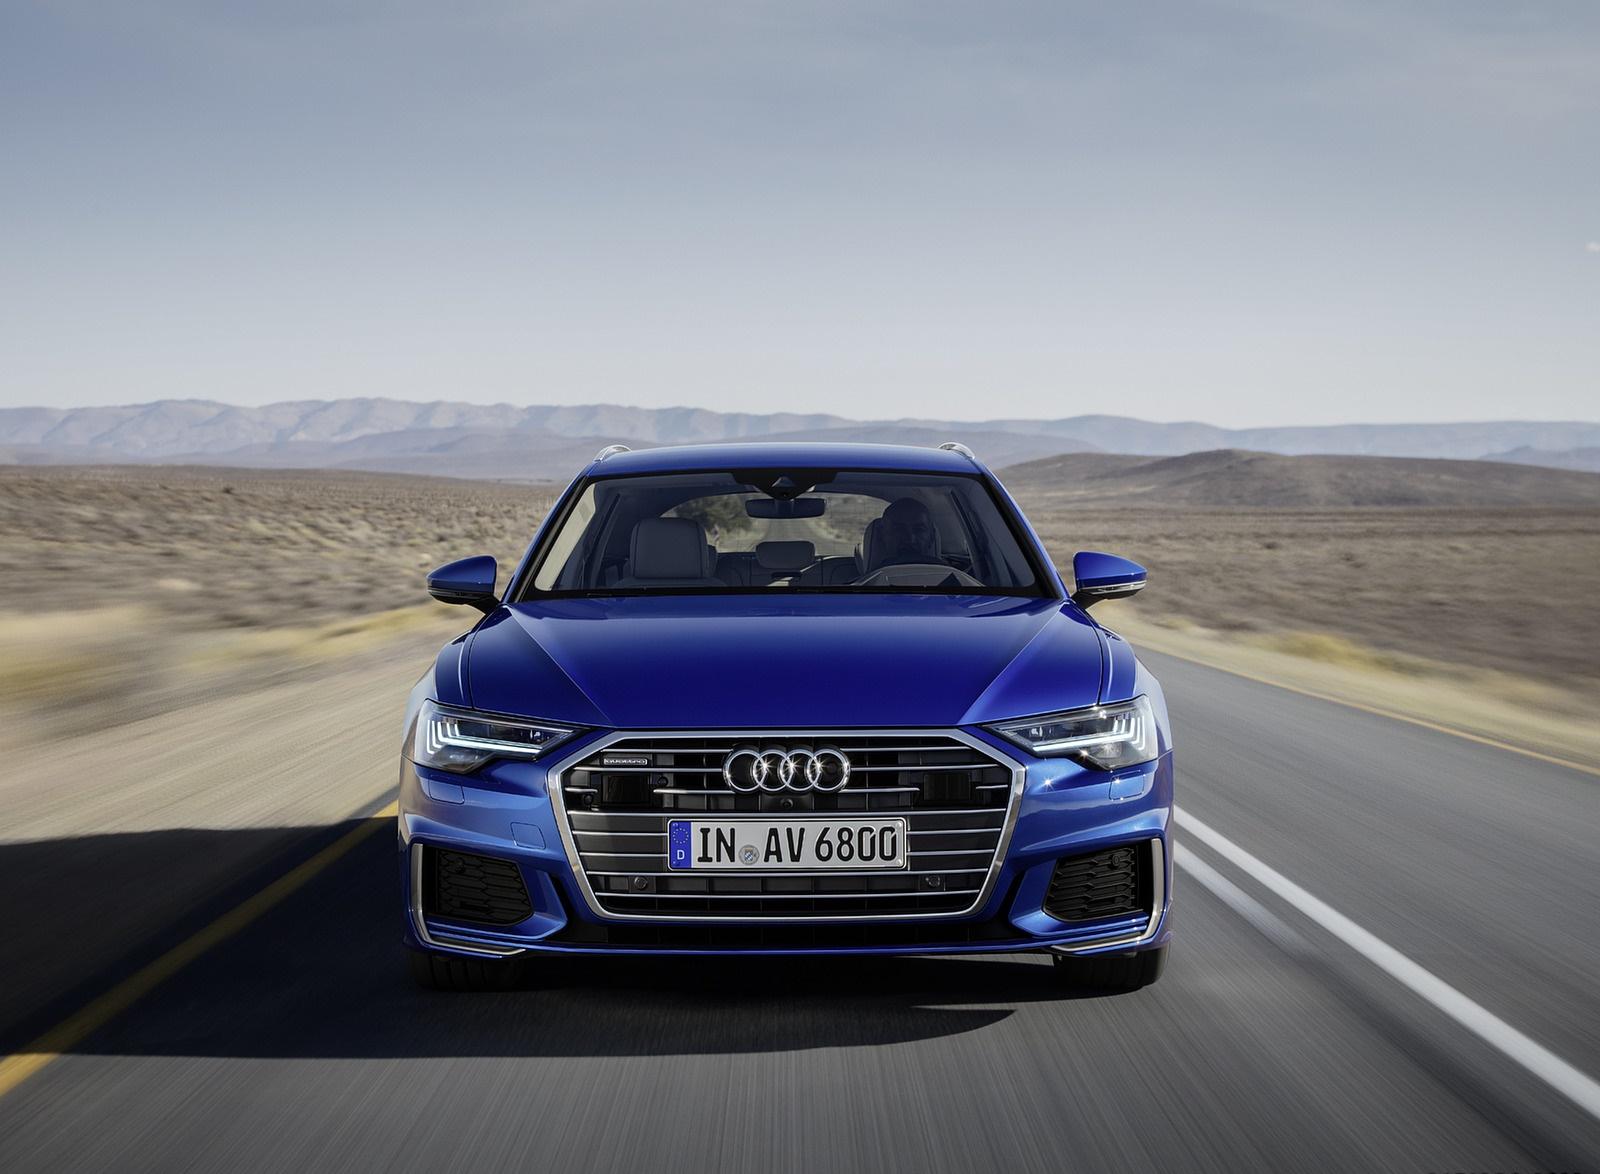 2019 Audi A6 Avant (Color: Sepang Blue) Front Wallpapers (2)